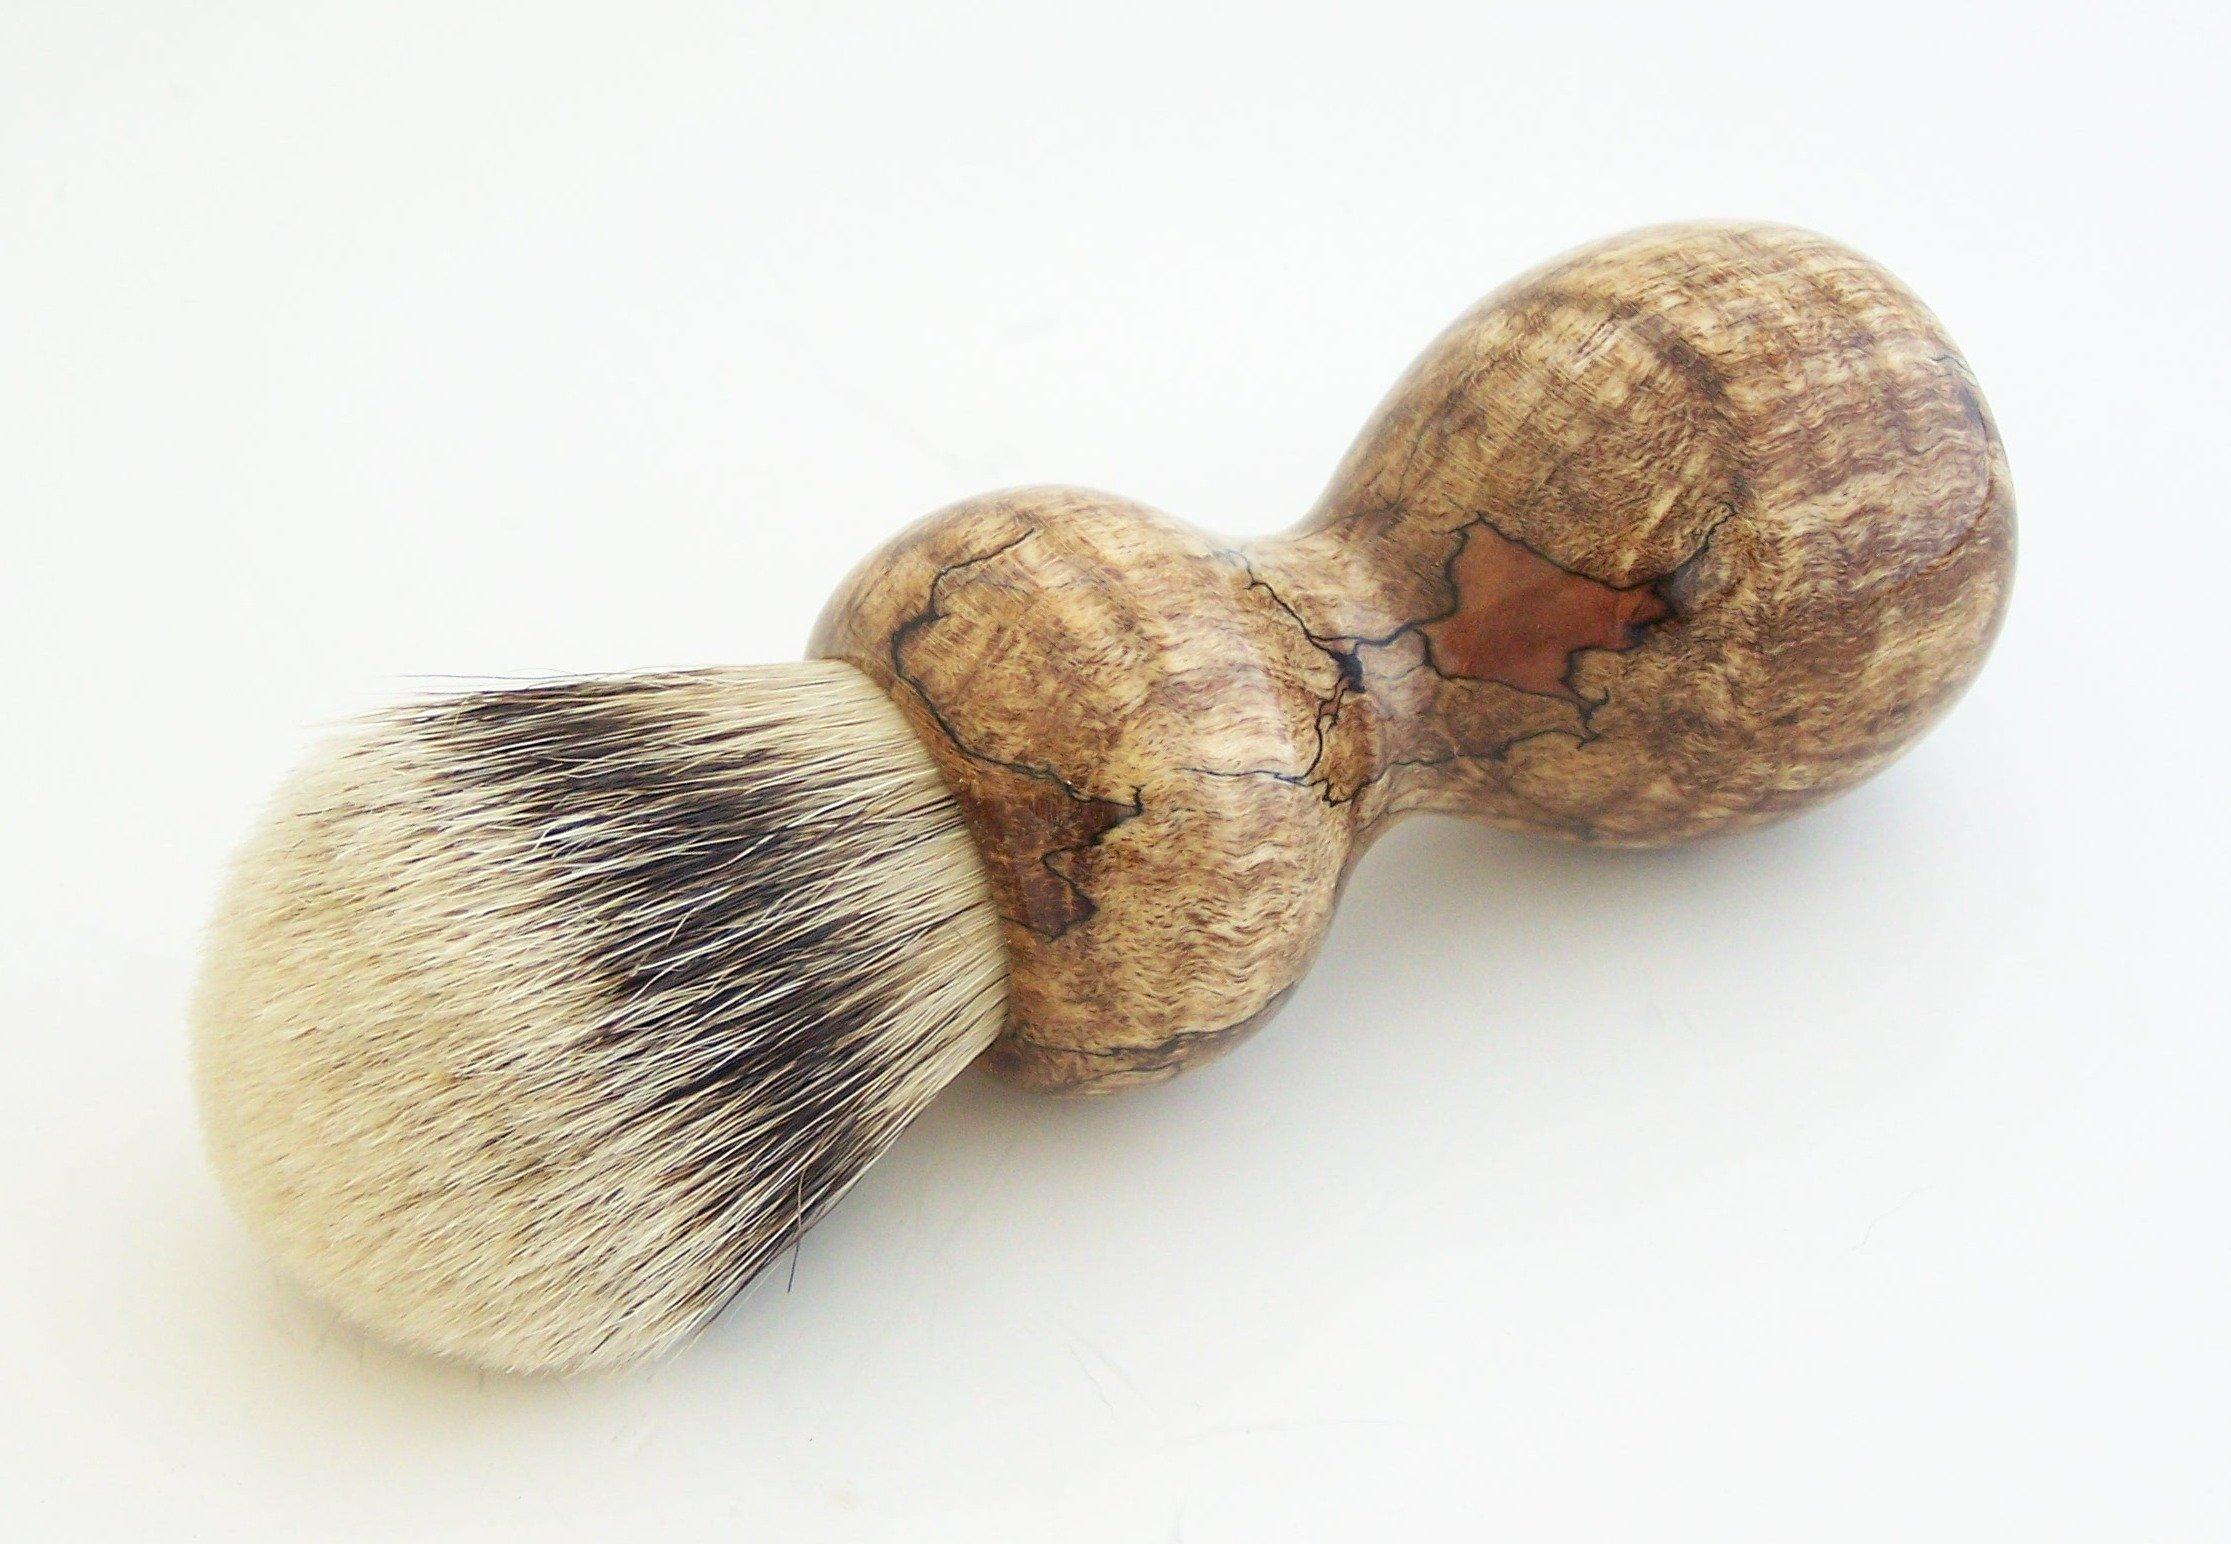 Stabilized Spalted Maple Burl Wood 24mm Super Silvertip Shaving Brush (M14)